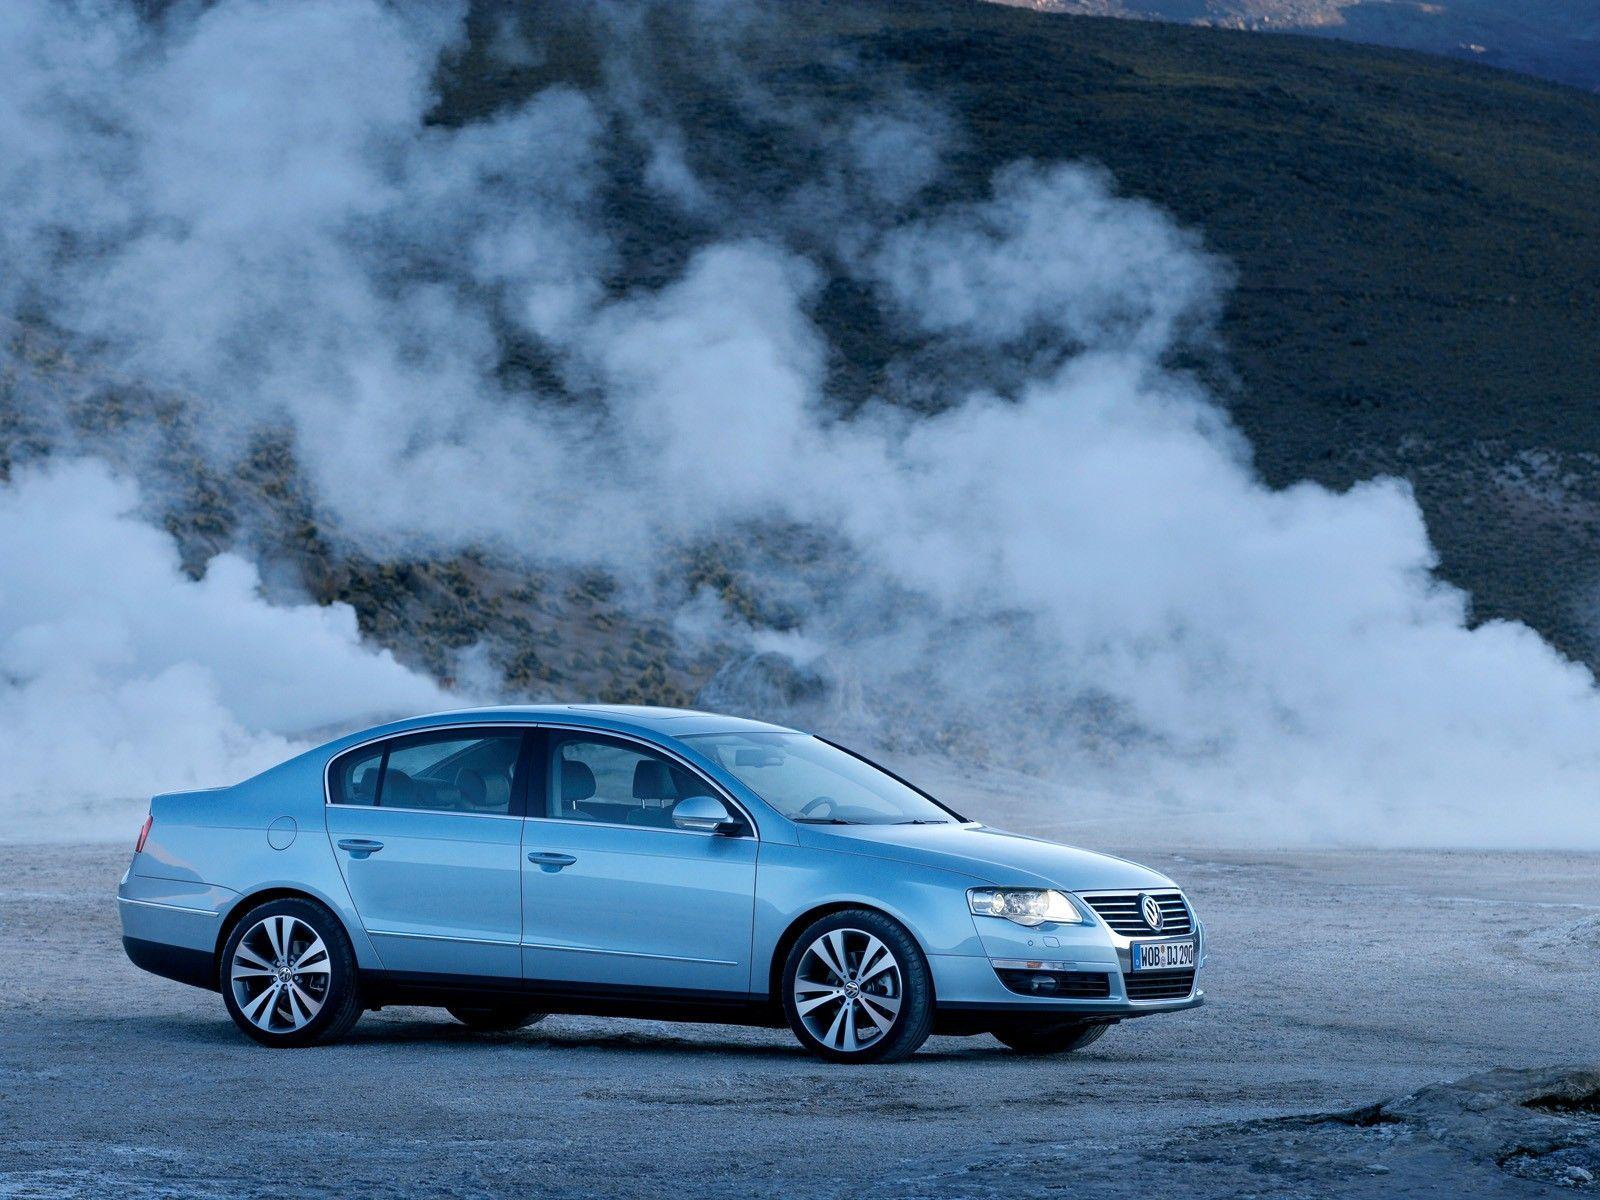 Volkswagen passat blue sedans wallpaper volkswagenwallpaperhtml resolutionsbluesedanspicturesvehicles